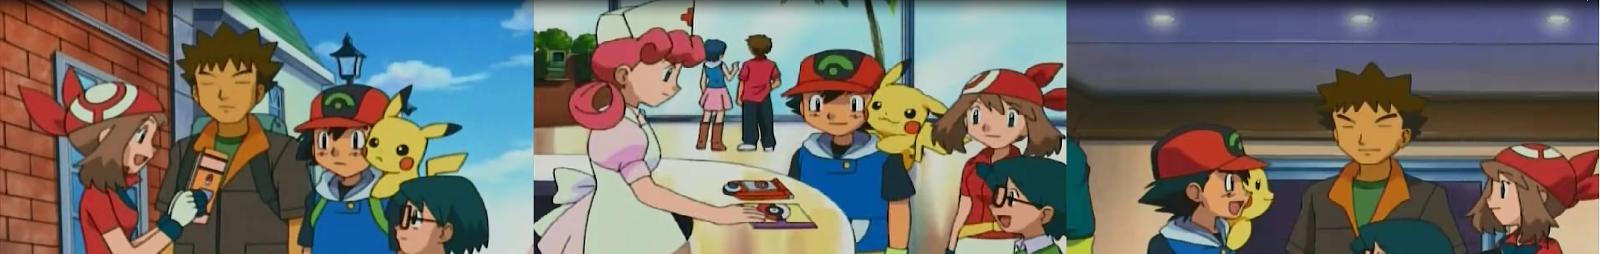 Pokemon Capitulo 32 Temporada 8 La Curiosidad Mato Al Meowth